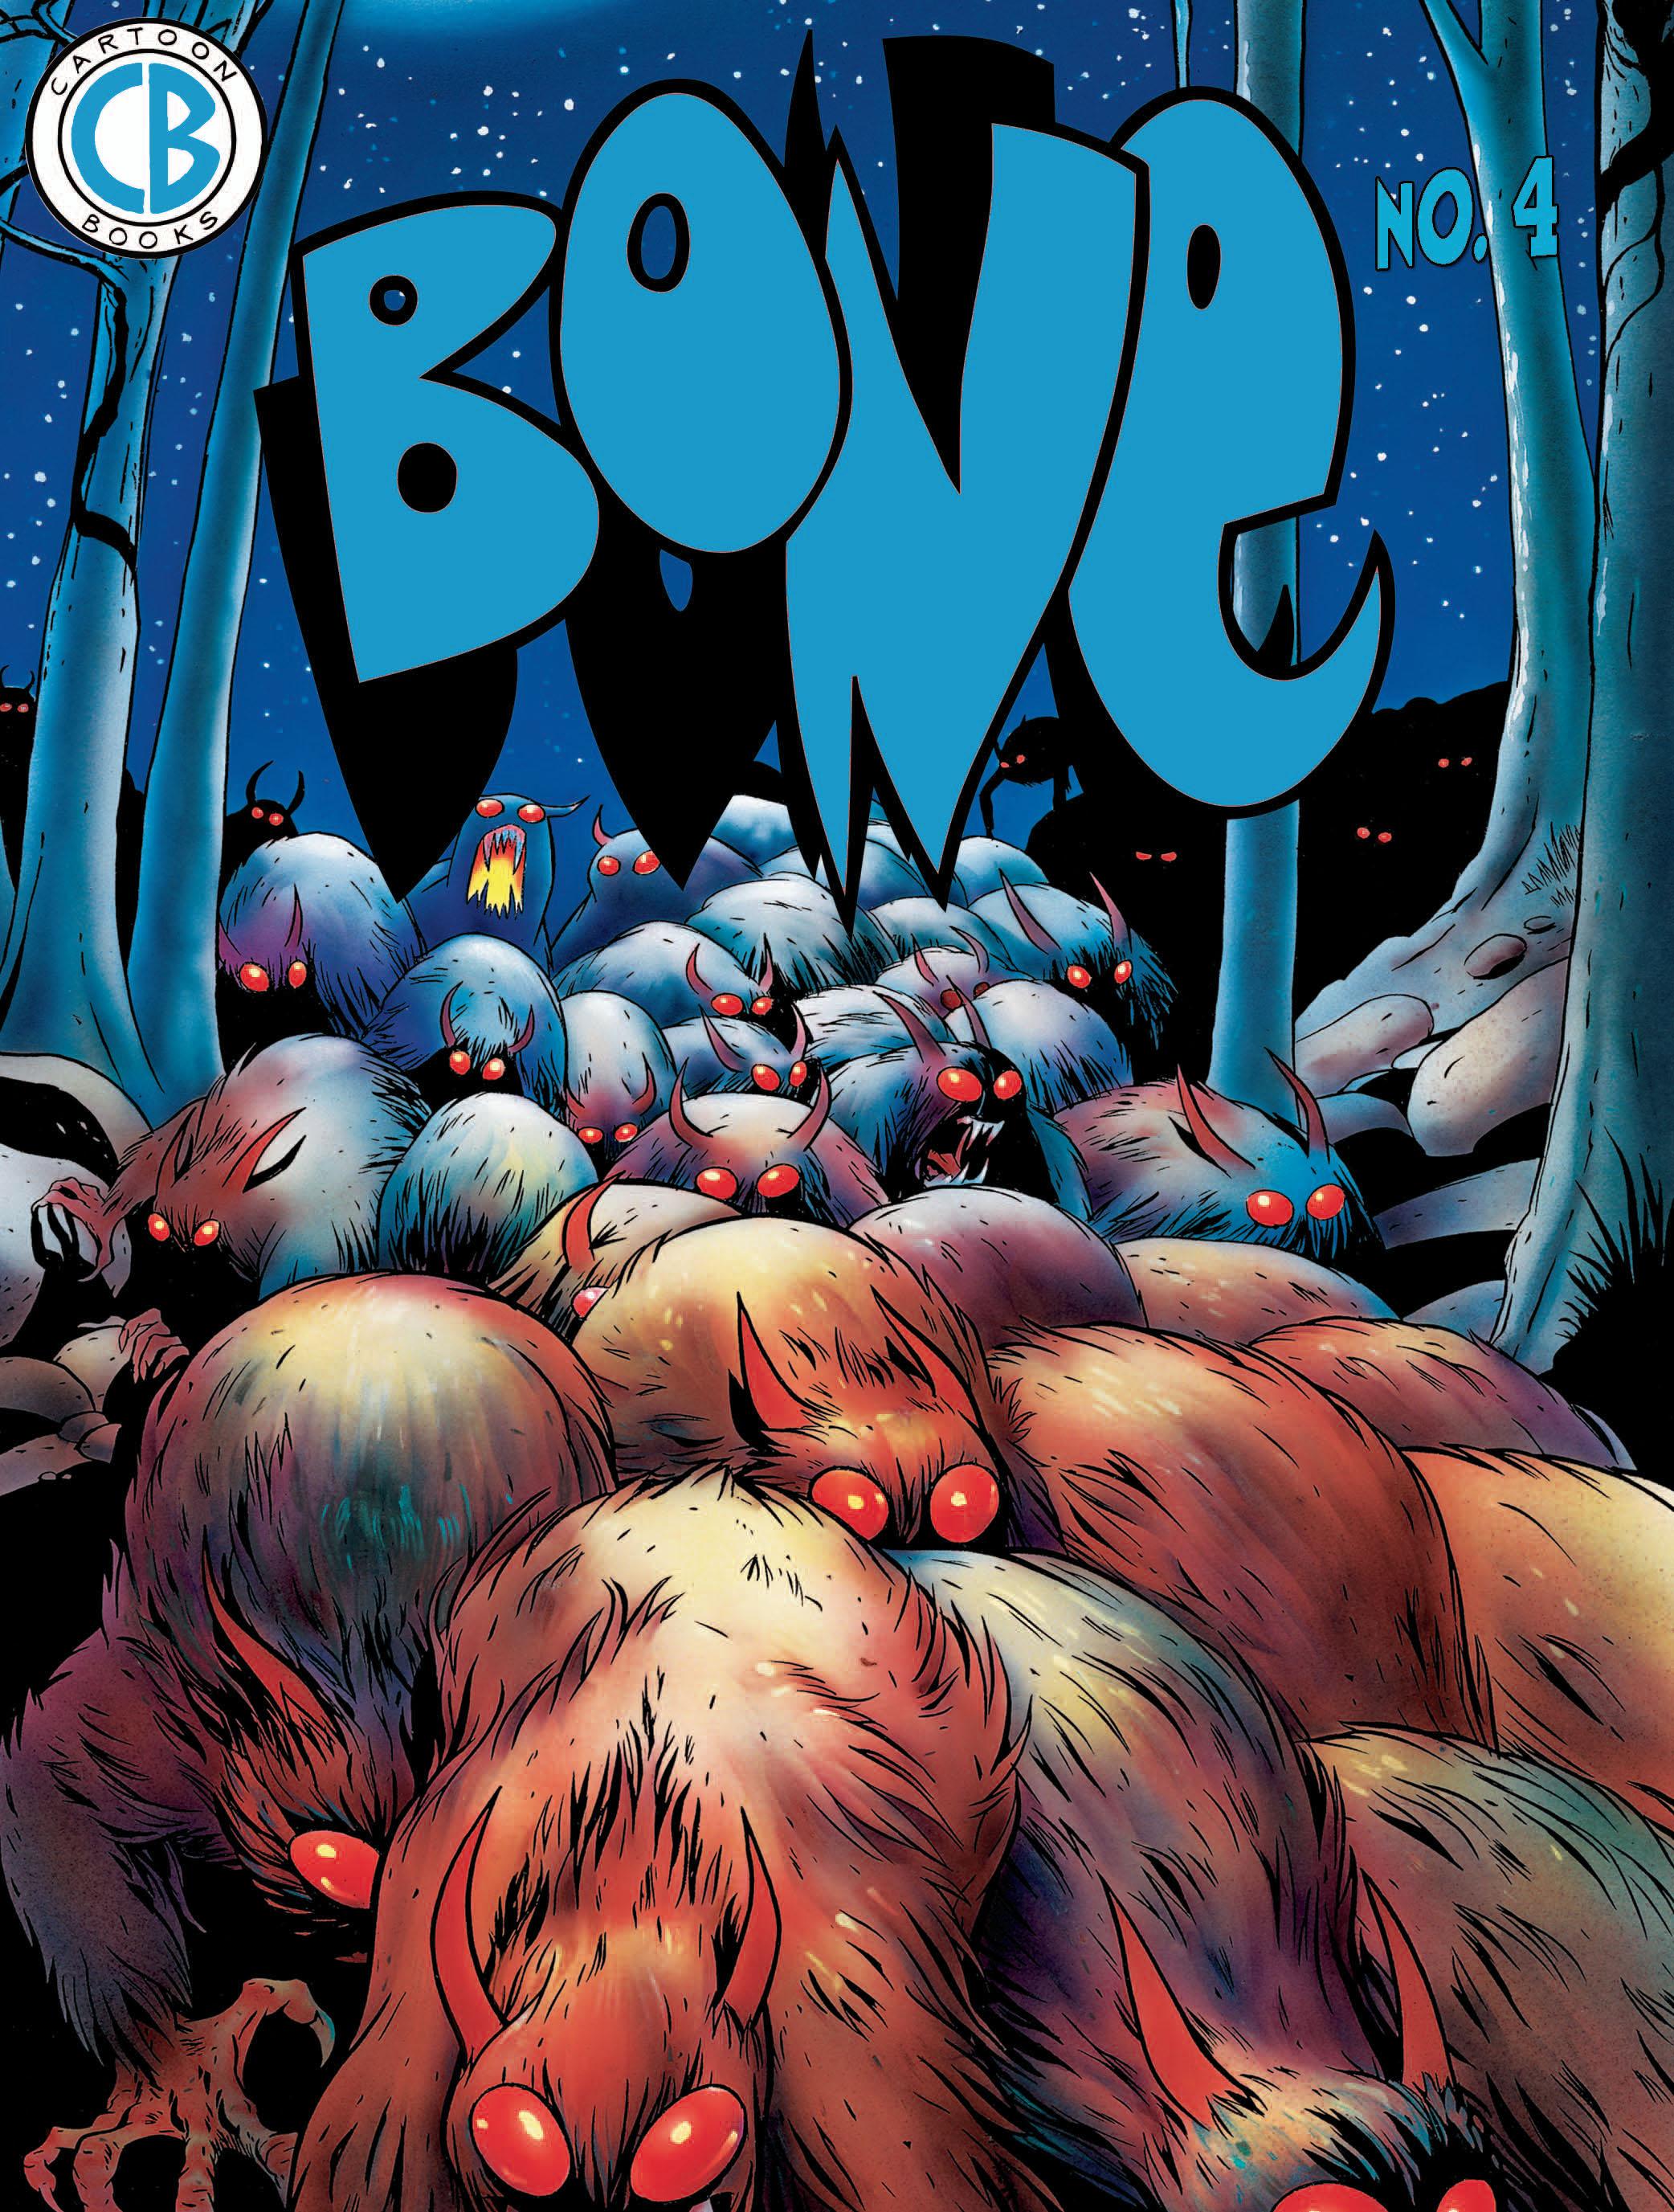 Bone 1991 Issue 4